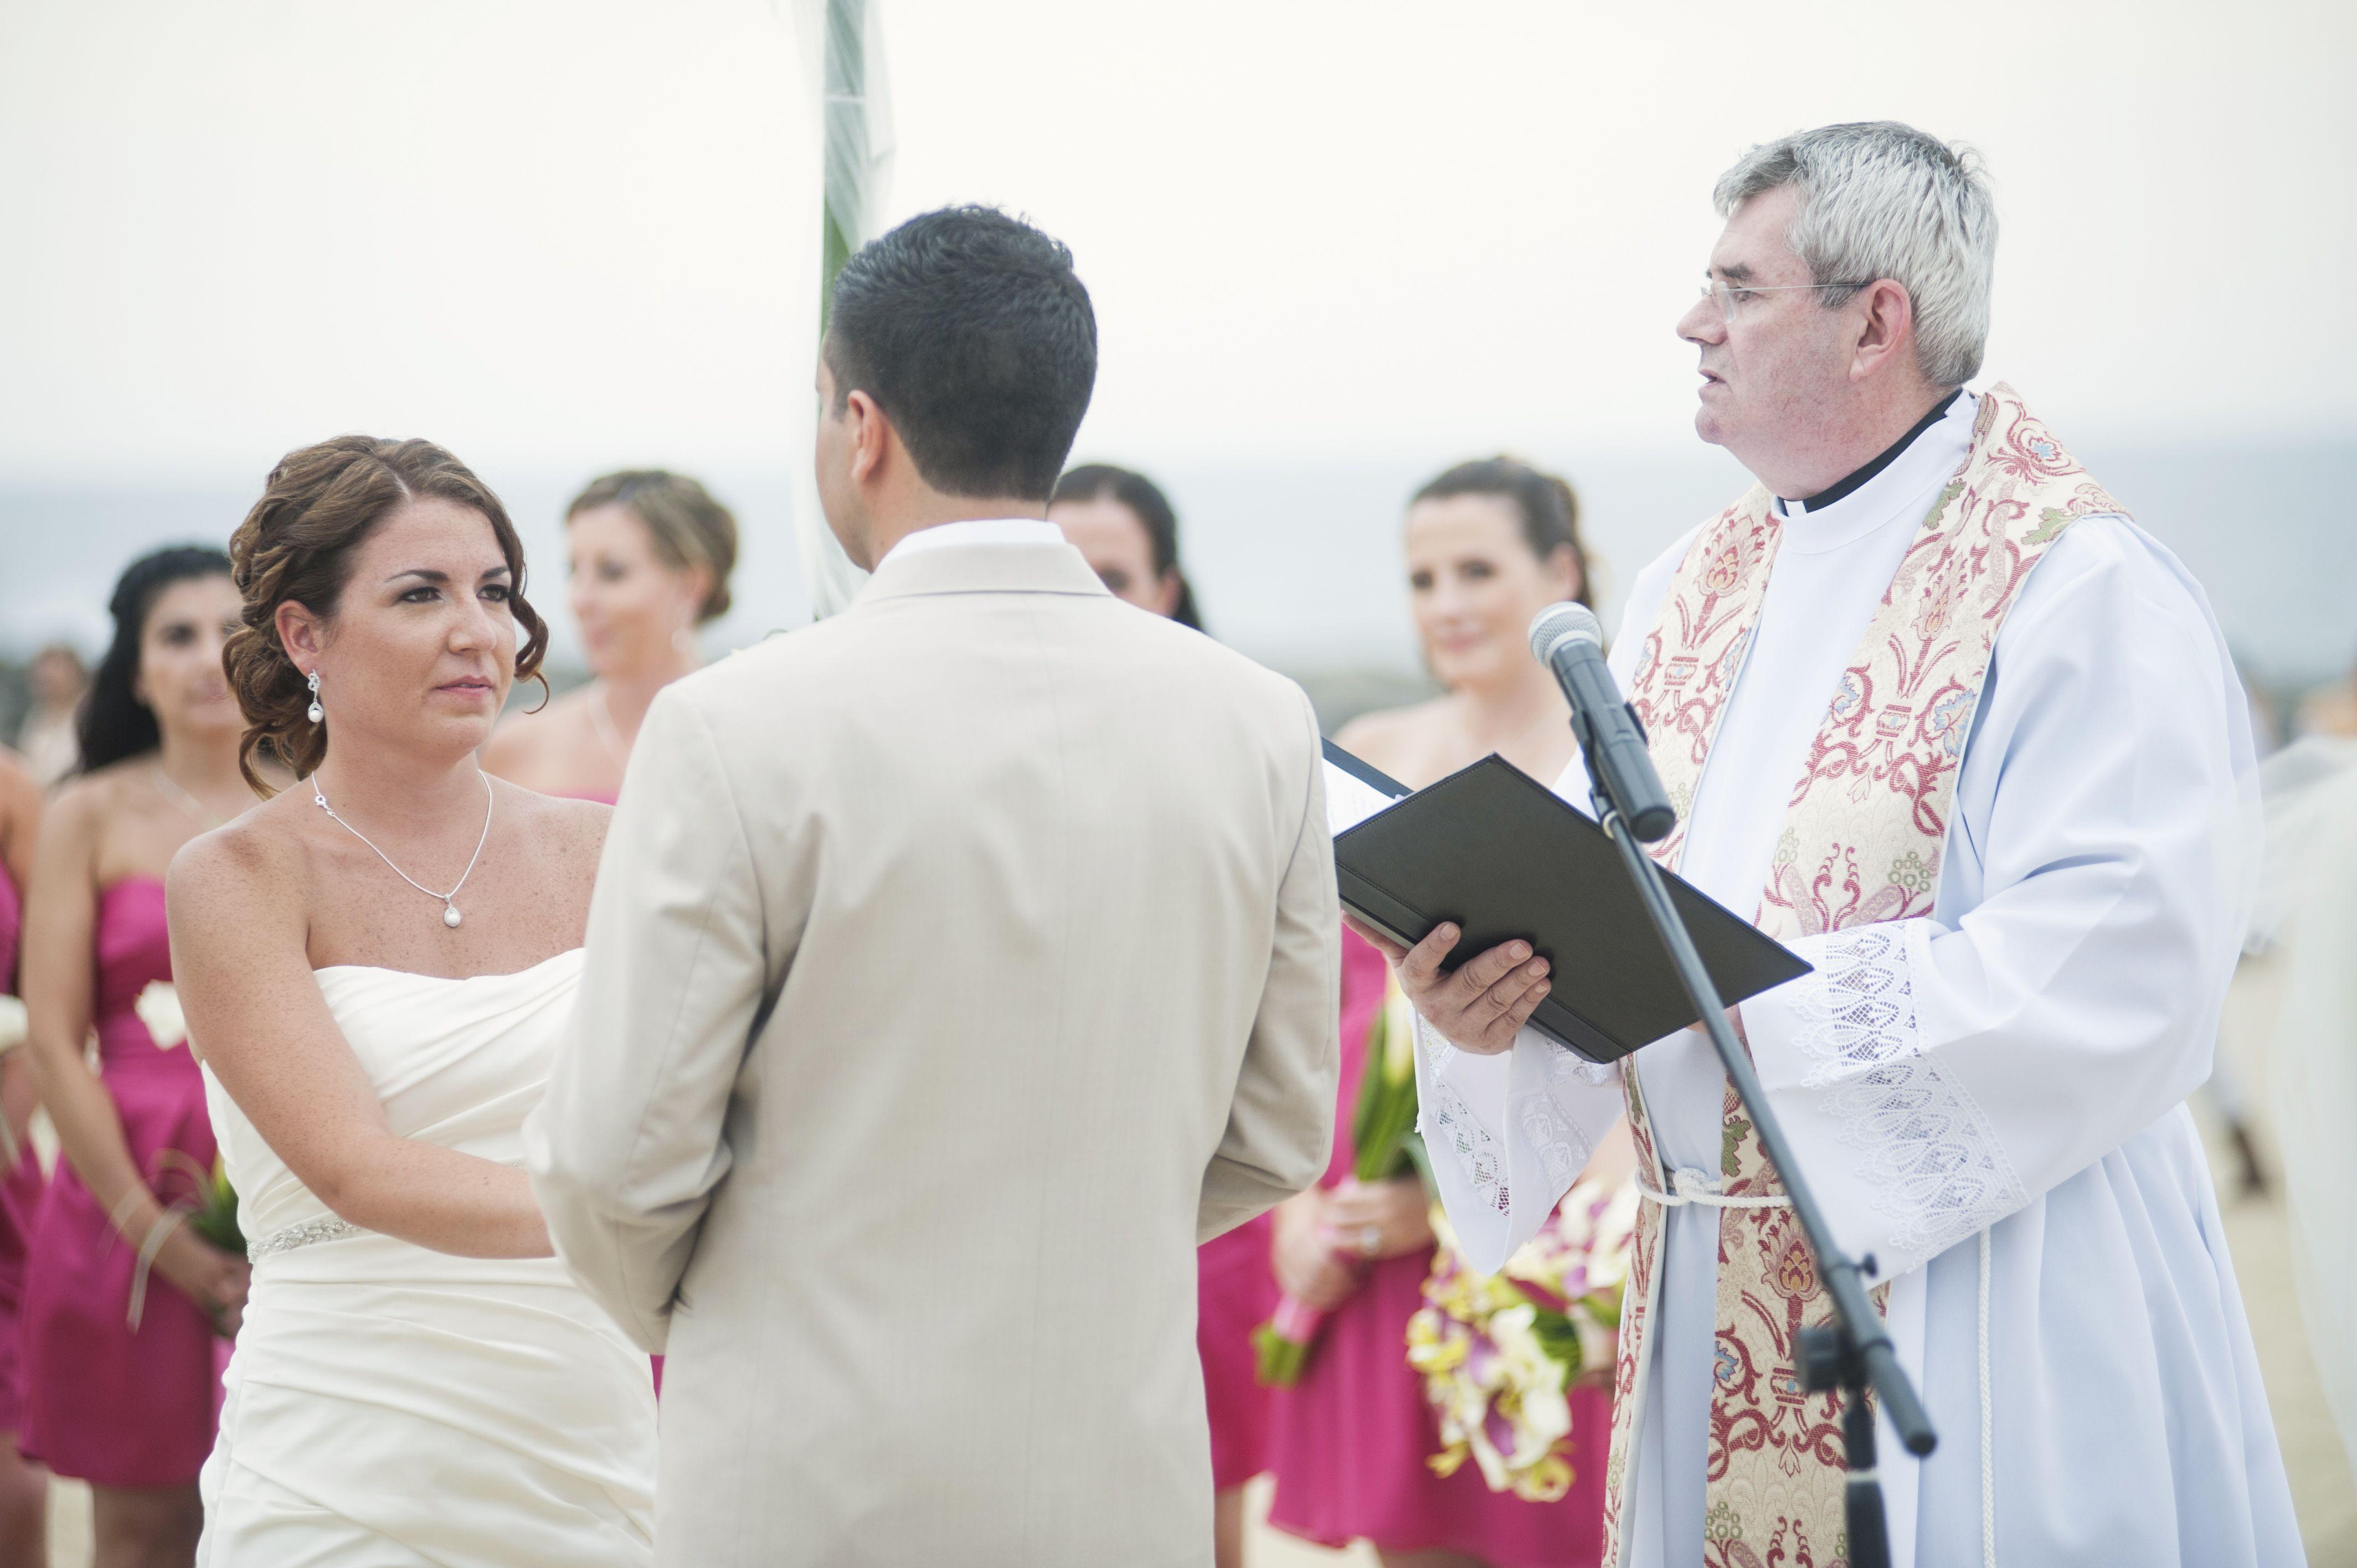 Jen and Vin, Married July. 28, 2012, Ashbury Park, NJ on